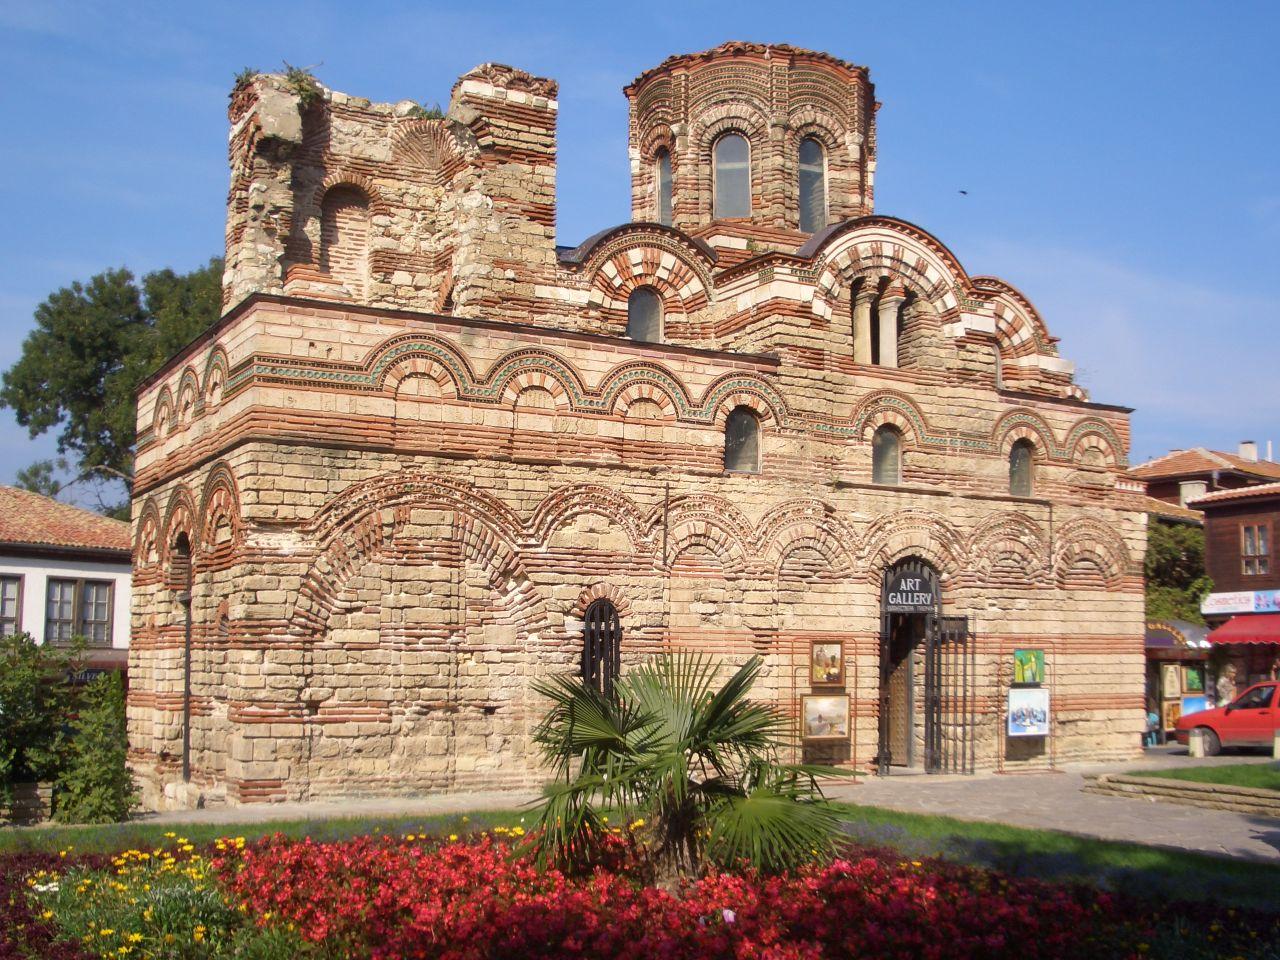 Nessebar Bulgaria  City pictures : Description Pantokrator church in Nessebar Bulgaria